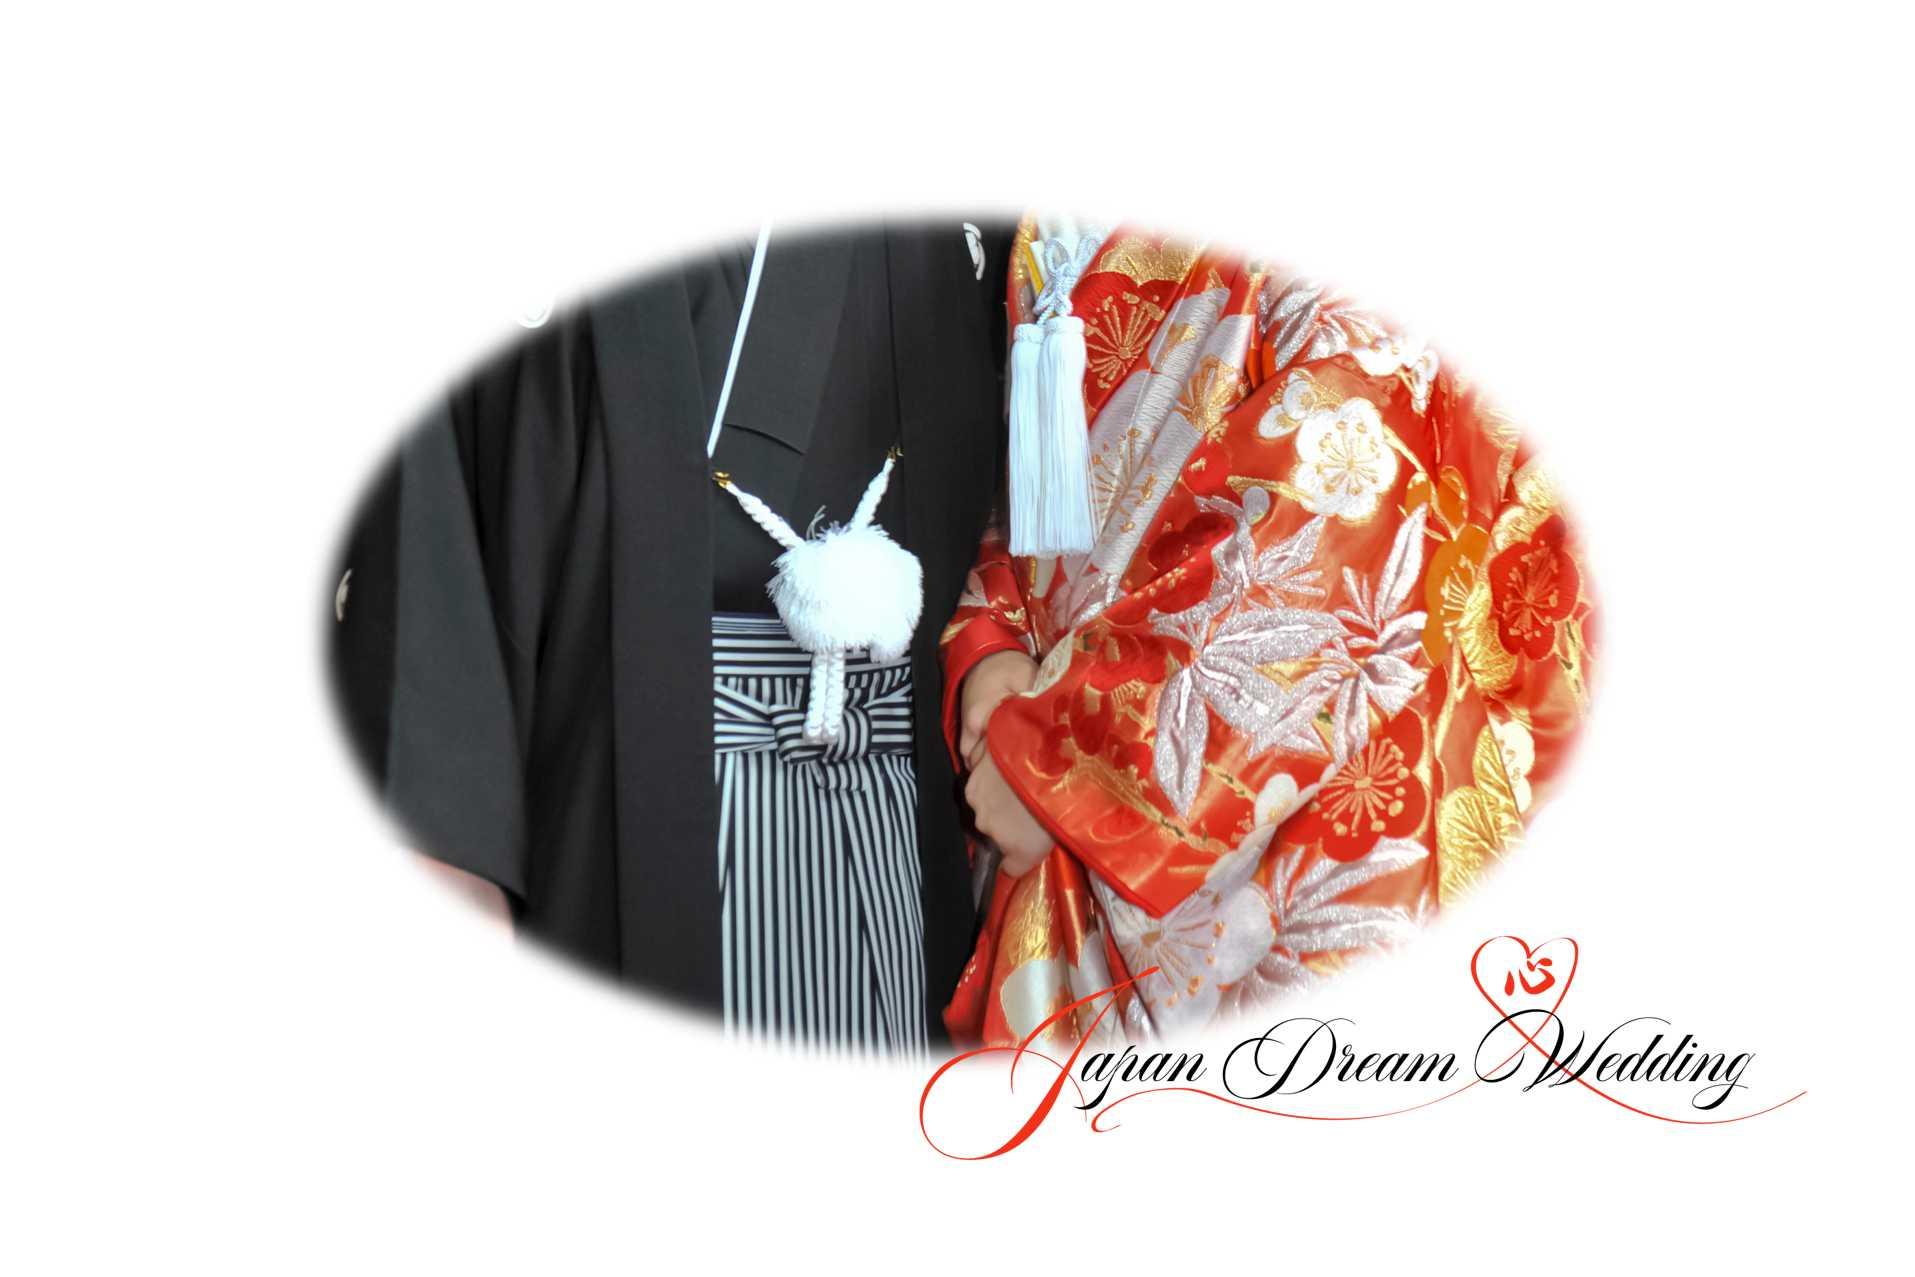 Japan Dream Wedding-Services-Wedding Ensembles